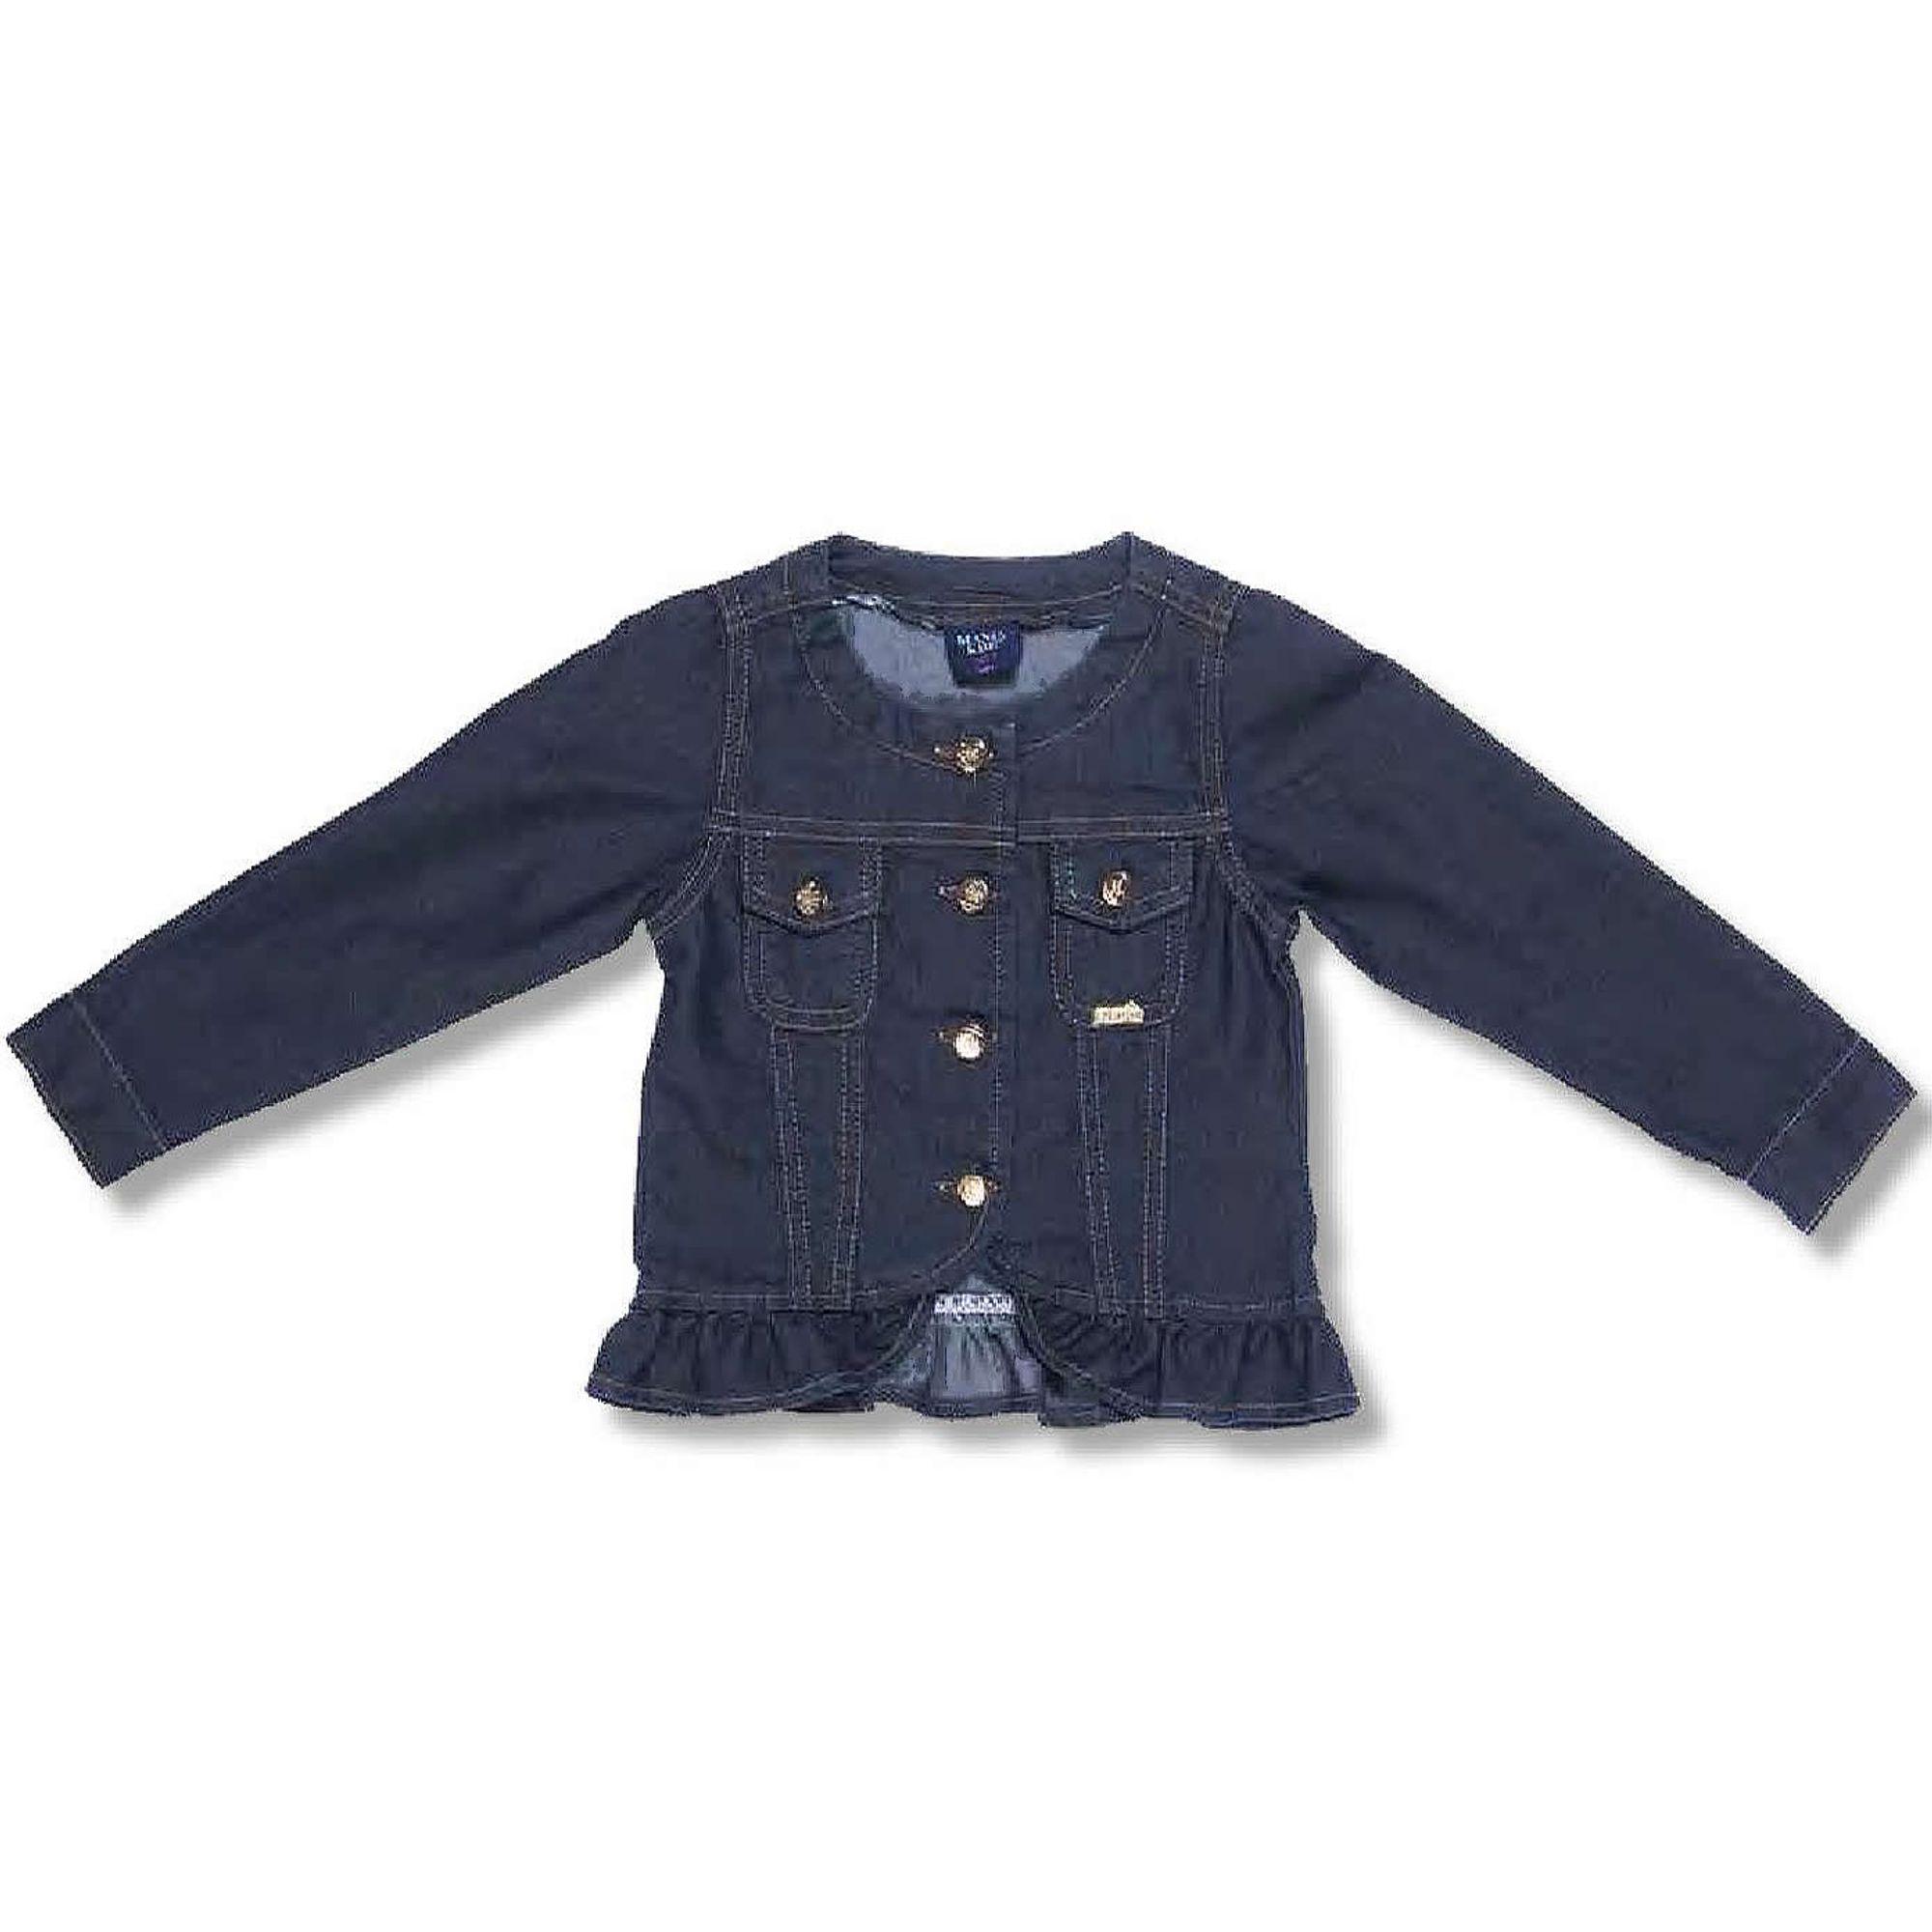 jaqueta-jeans-menina-com-babadinho-mania-kids